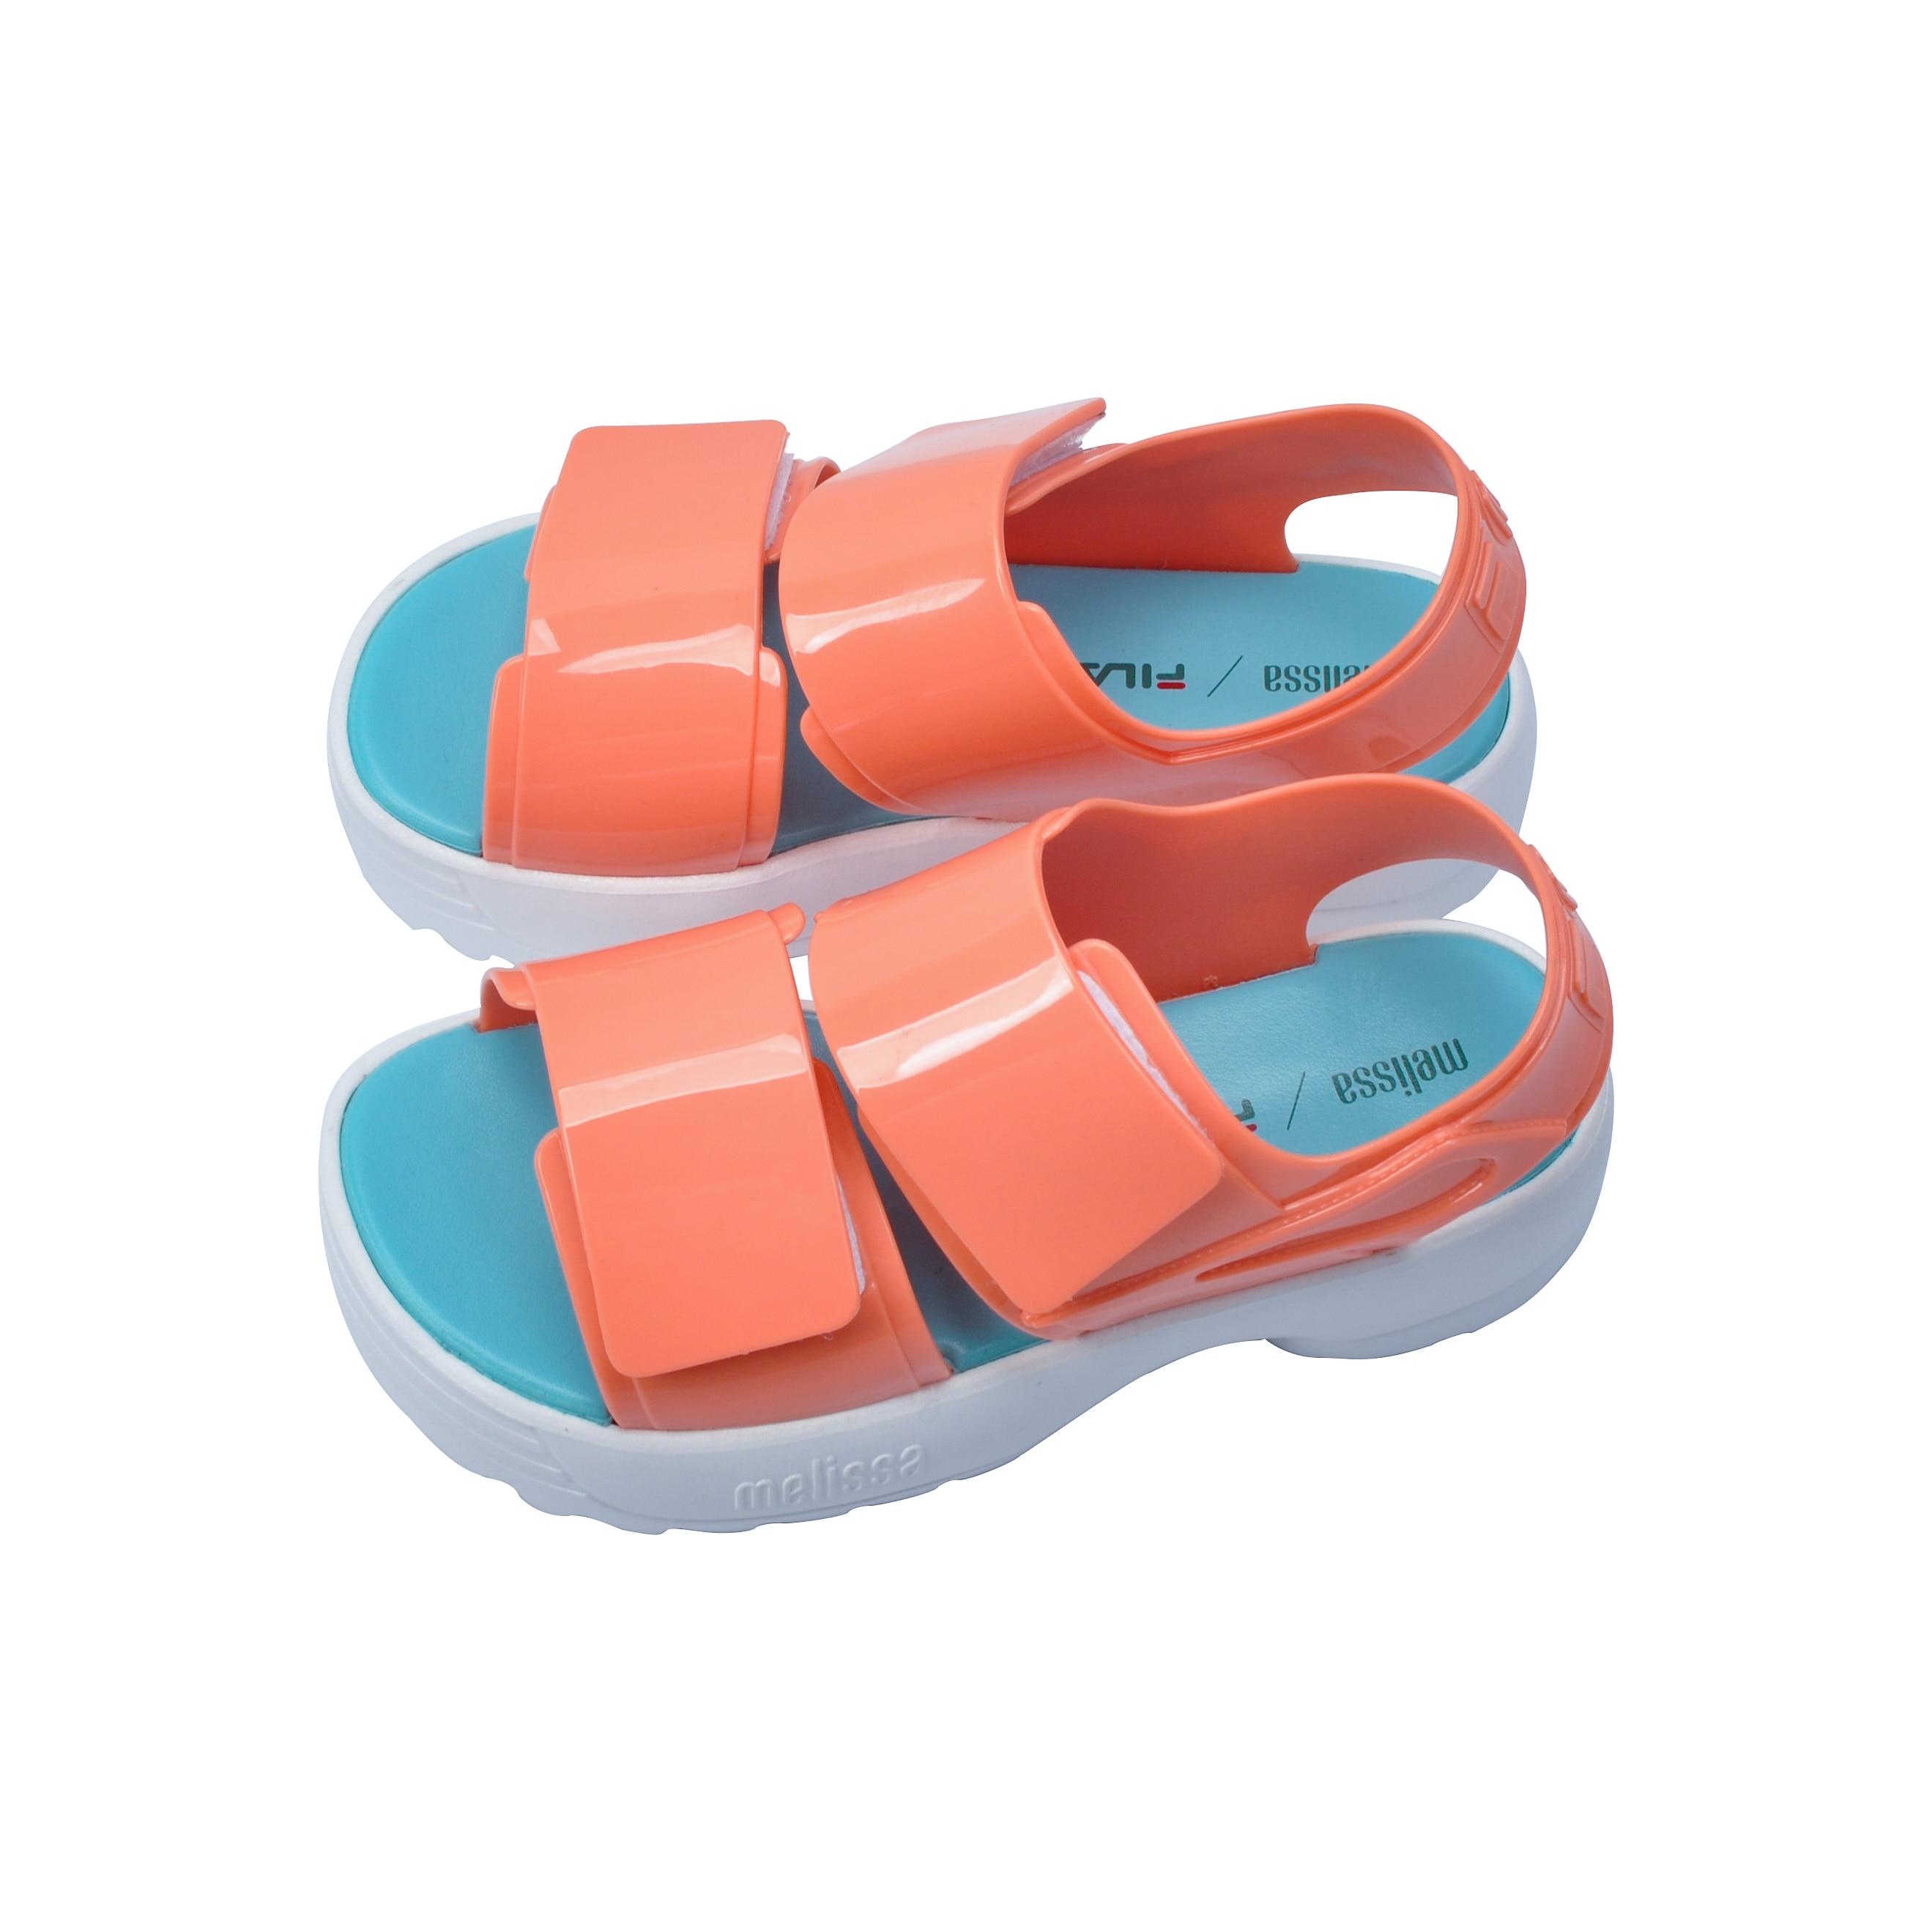 Melissa Brand Women Sandals 2019 New Fashion Ladies Casual Shoes Wedges Buckle Strap Platform Shoes 5